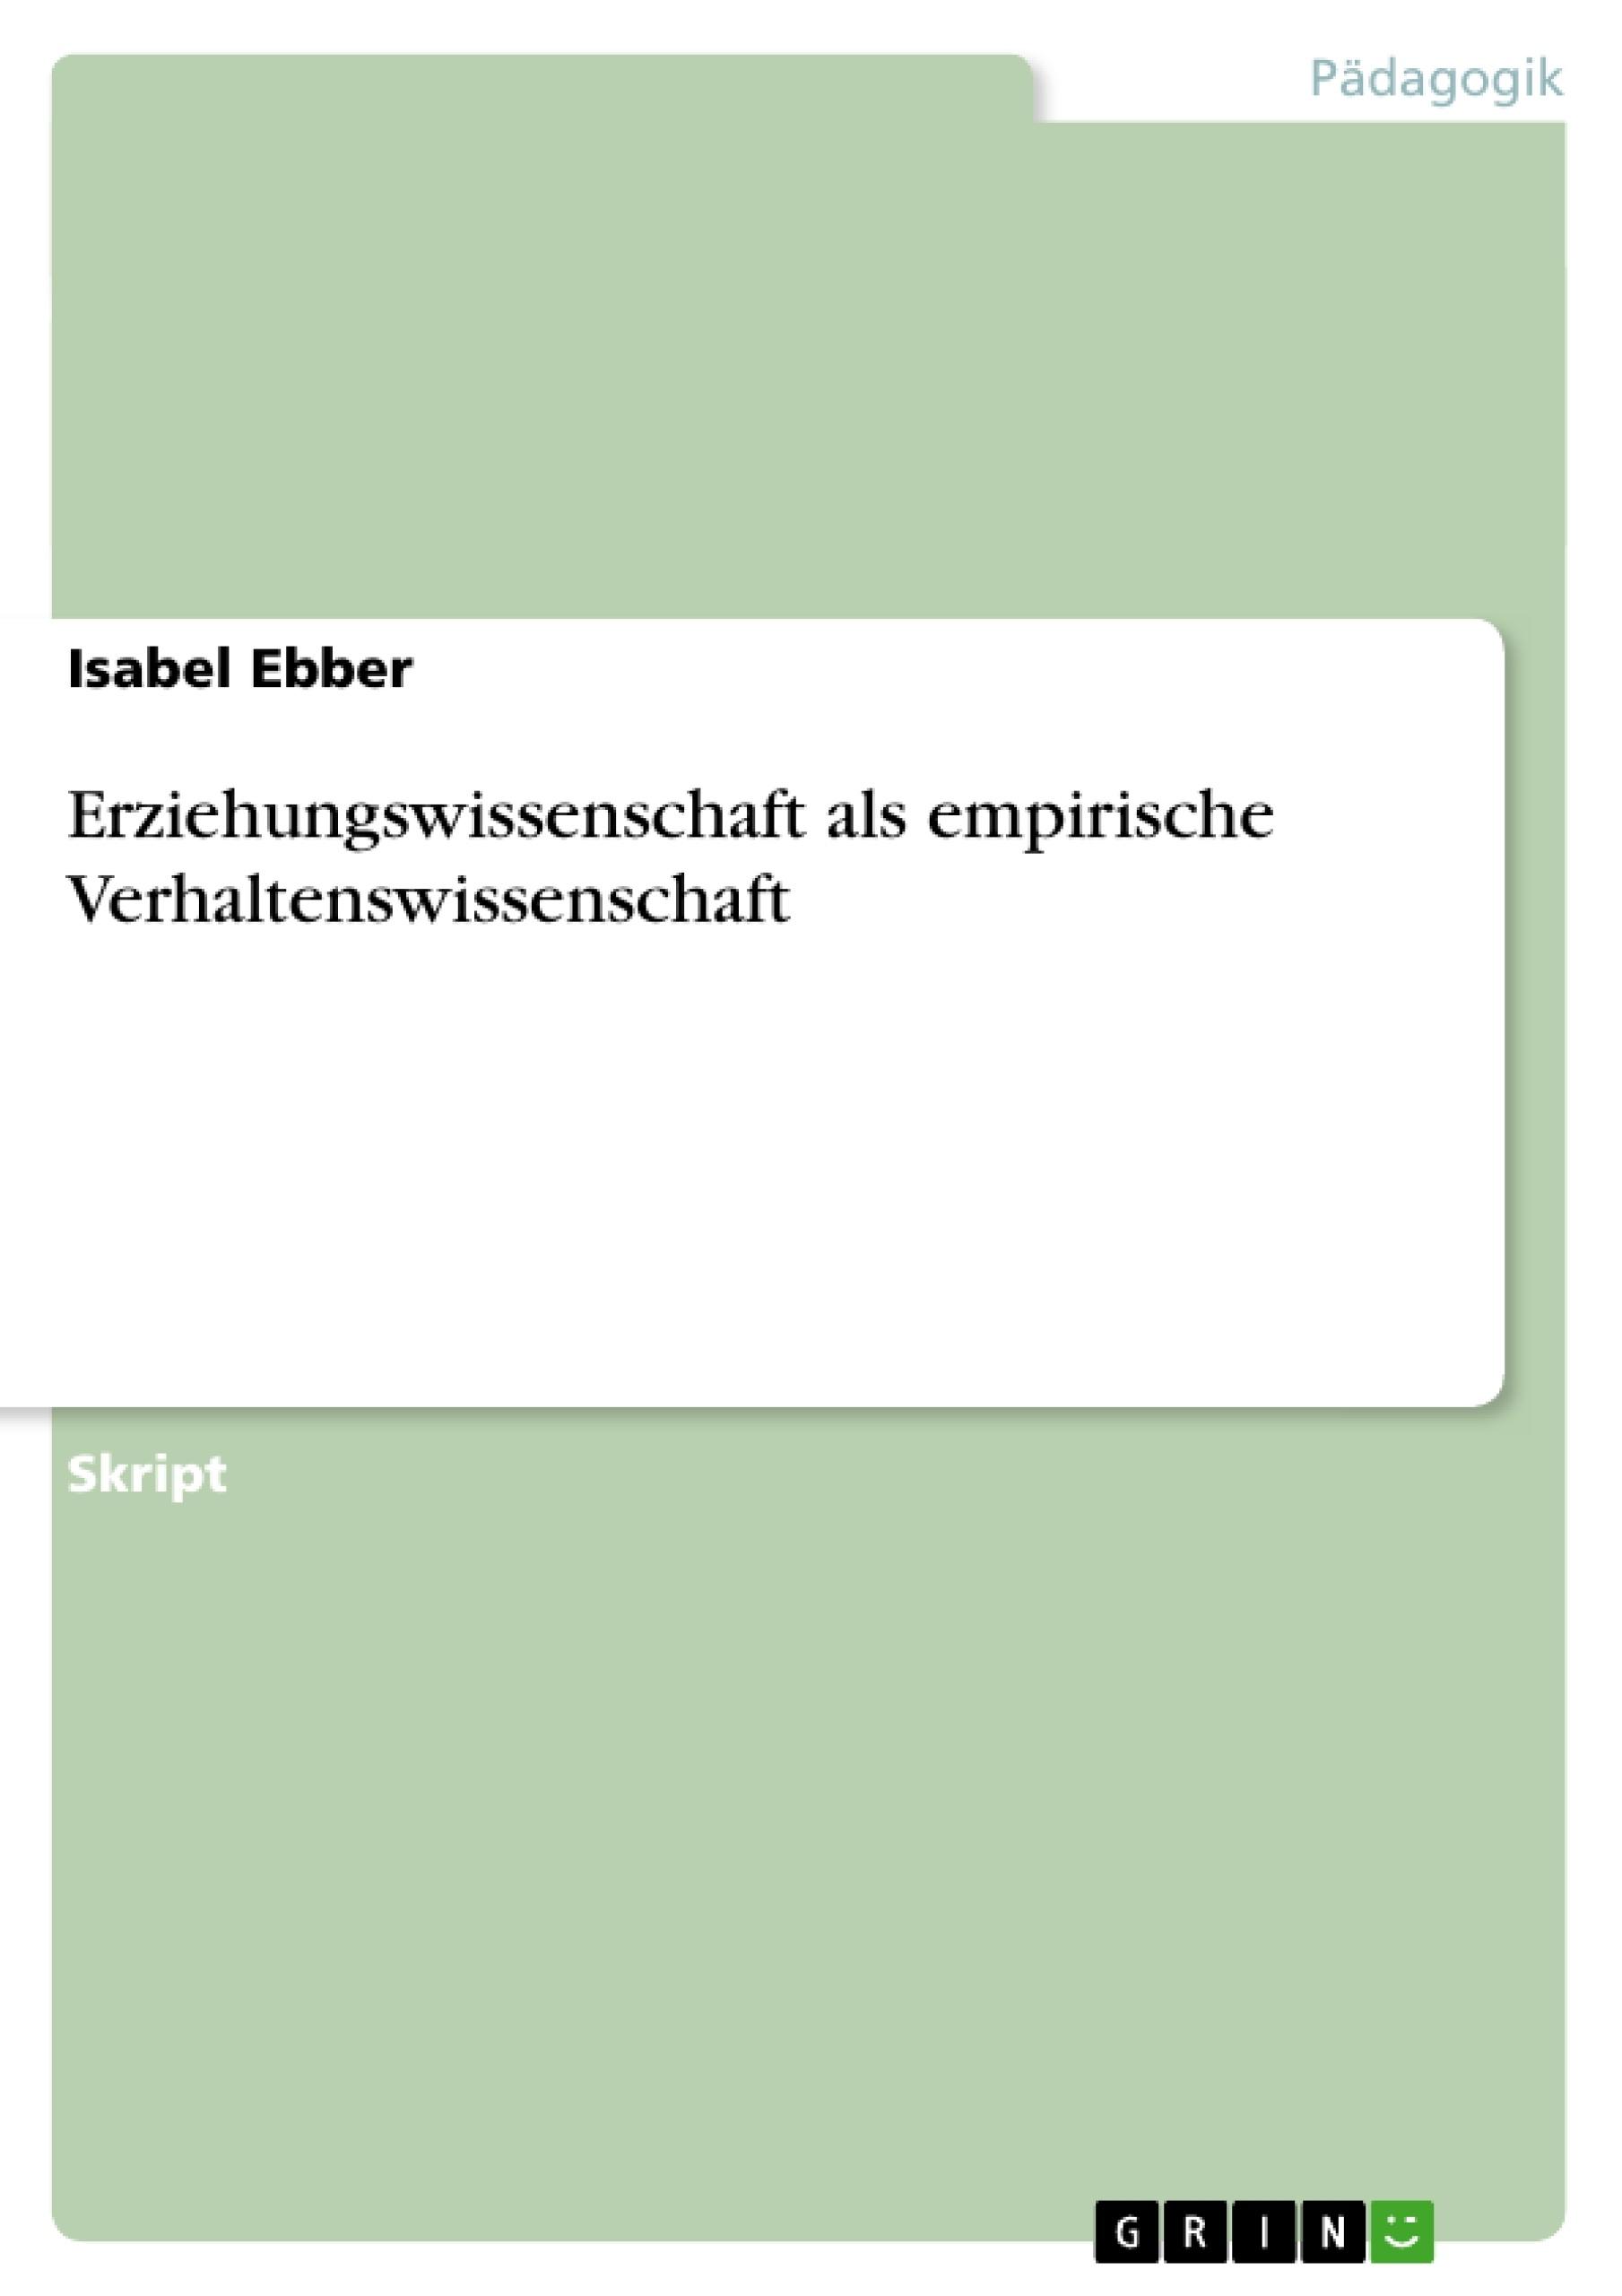 Titel: Erziehungswissenschaft als empirische Verhaltenswissenschaft